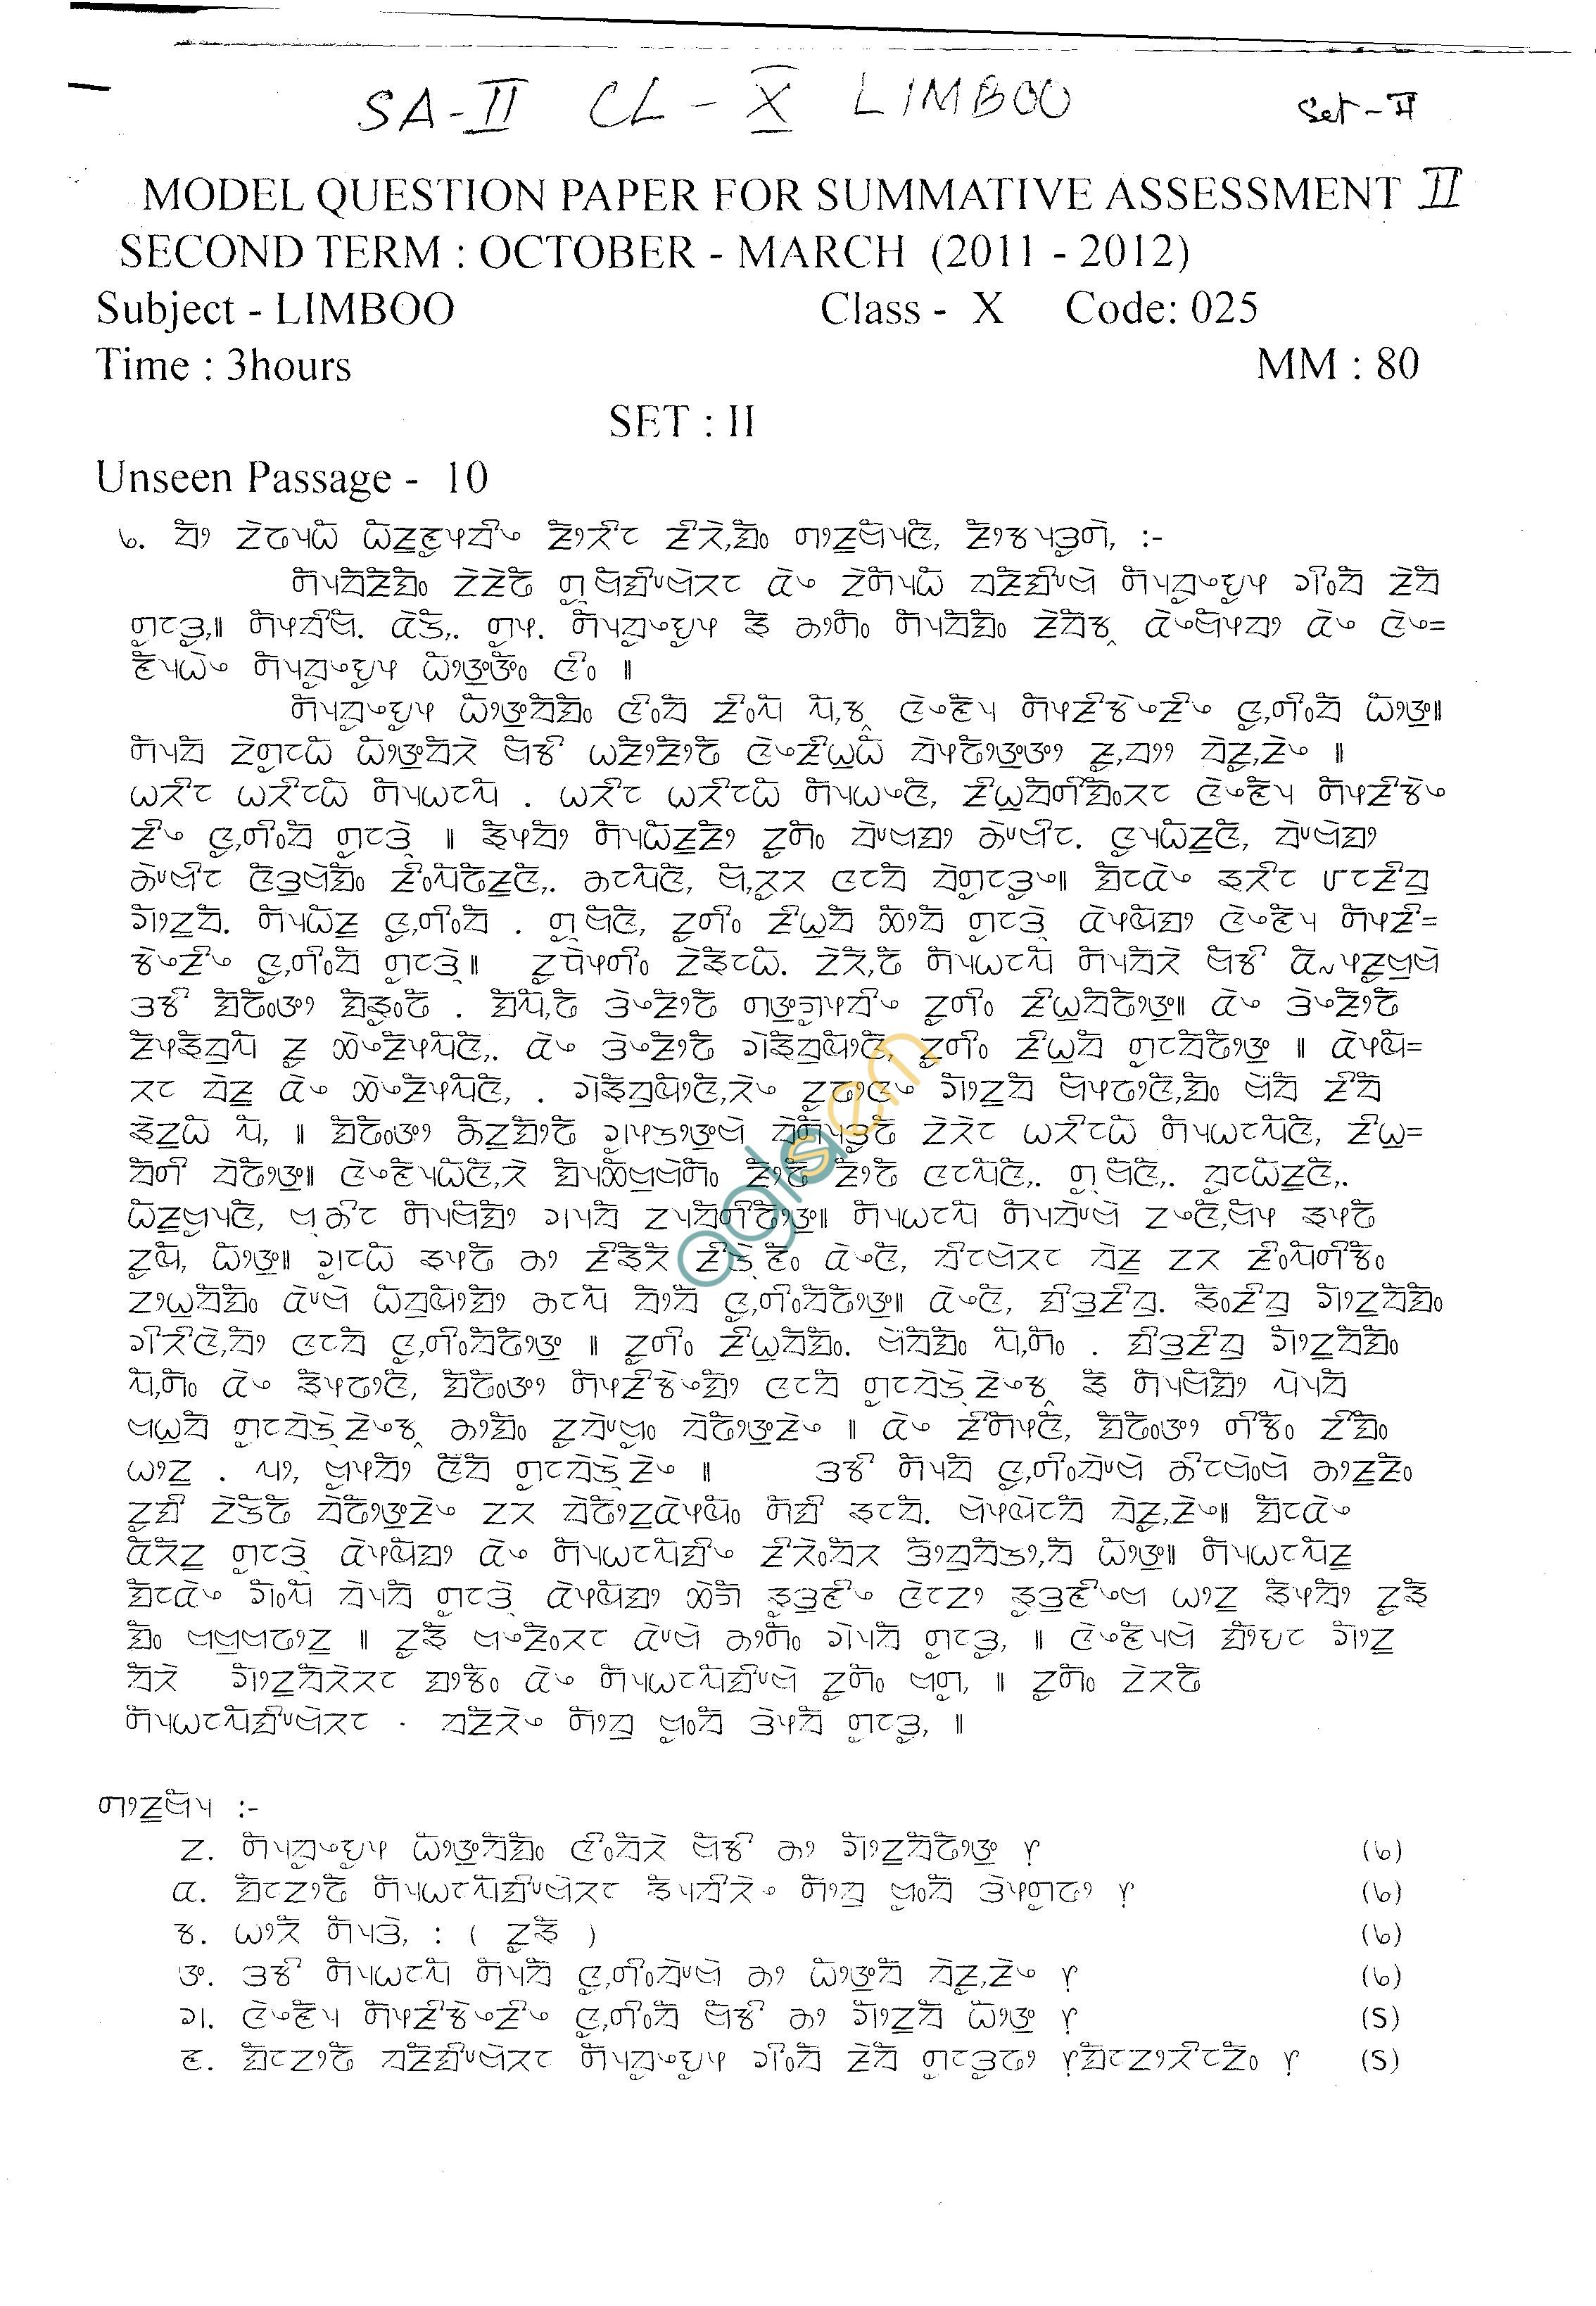 CBSE Class IX & X Sample Papers 2014 (Second Term) Limboo